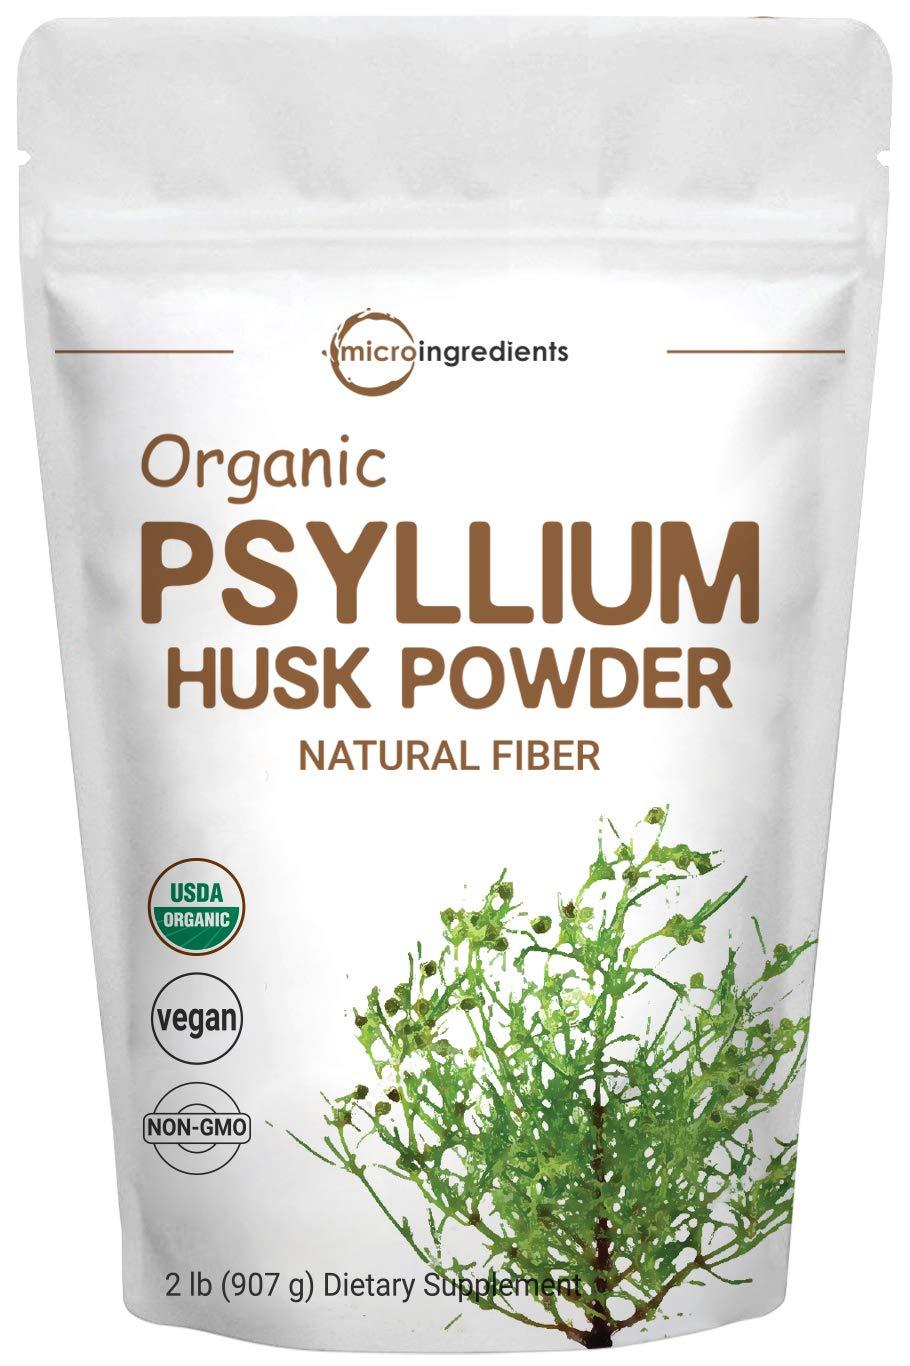 Organic Psyllium Husk Powder, 2 Pound (32 Ounce), Natural Fiber, Psyllium Husk Powder for Baking, Smoothie and Beverage, No GMOs and Vegan Friendly